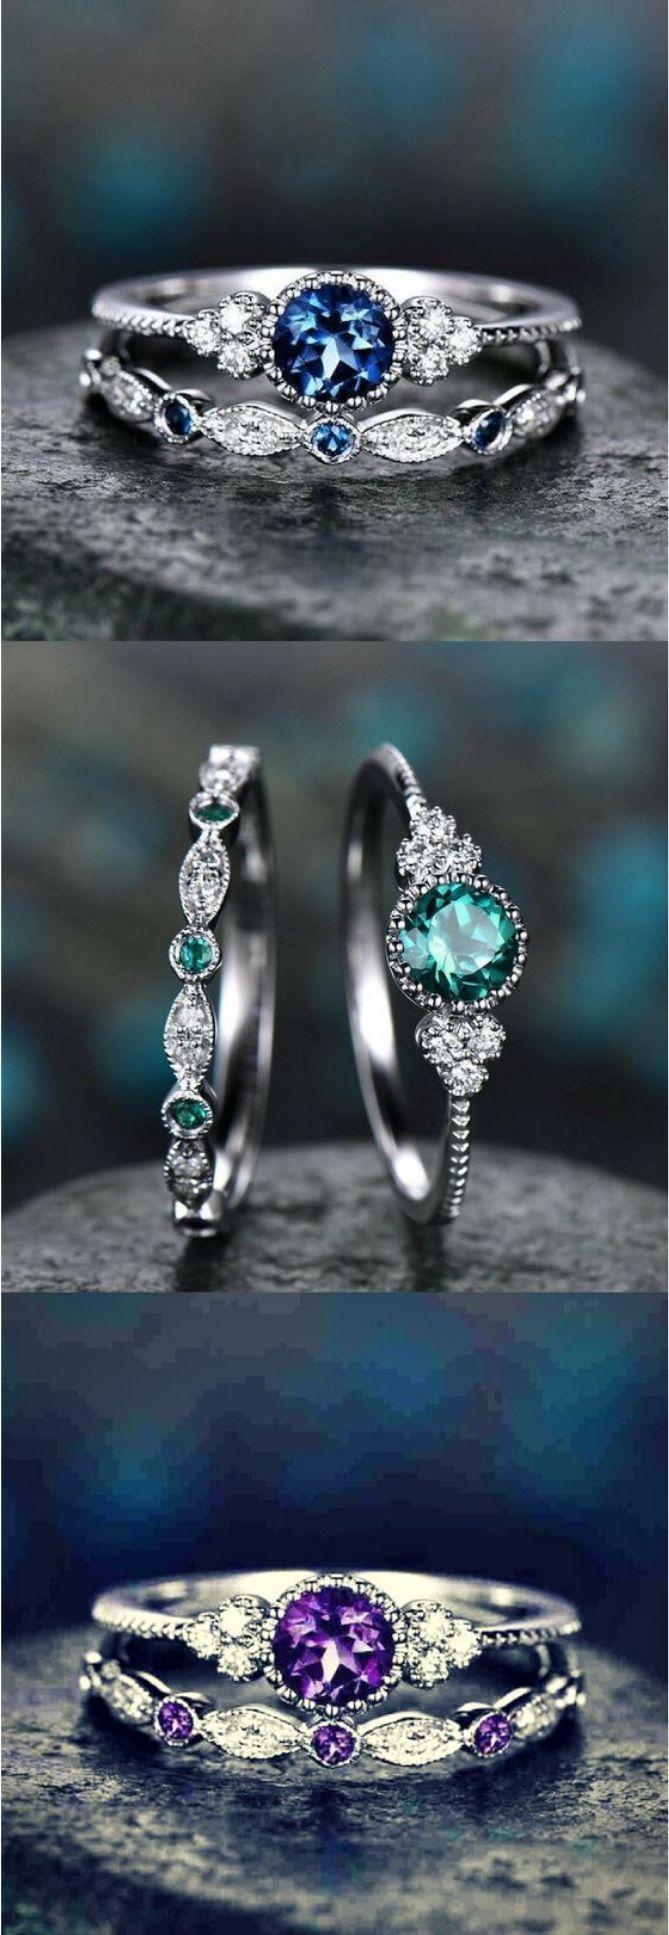 2Pcs Green Blue Stone Crystal Rings